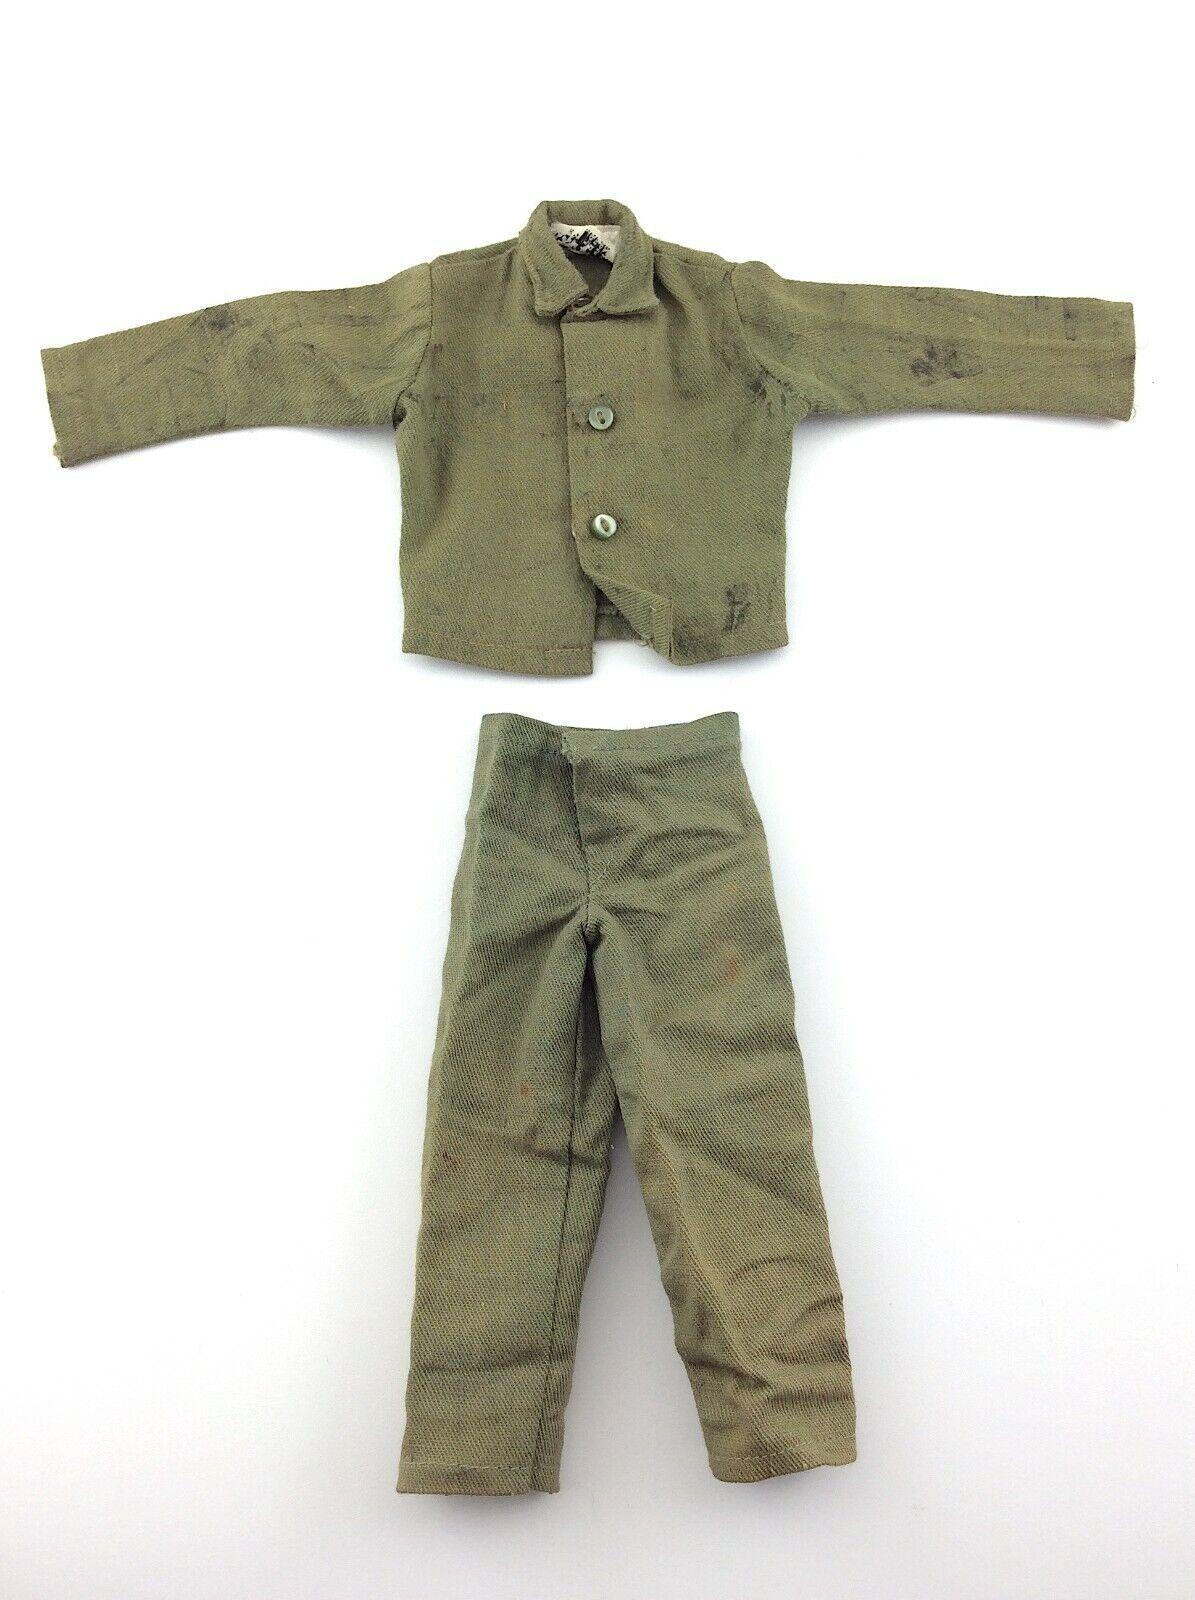 Jahr GI Joe Khaki Fatigues Uniform Wirkung Soldier Hasbro Spielzeug Accessory L619